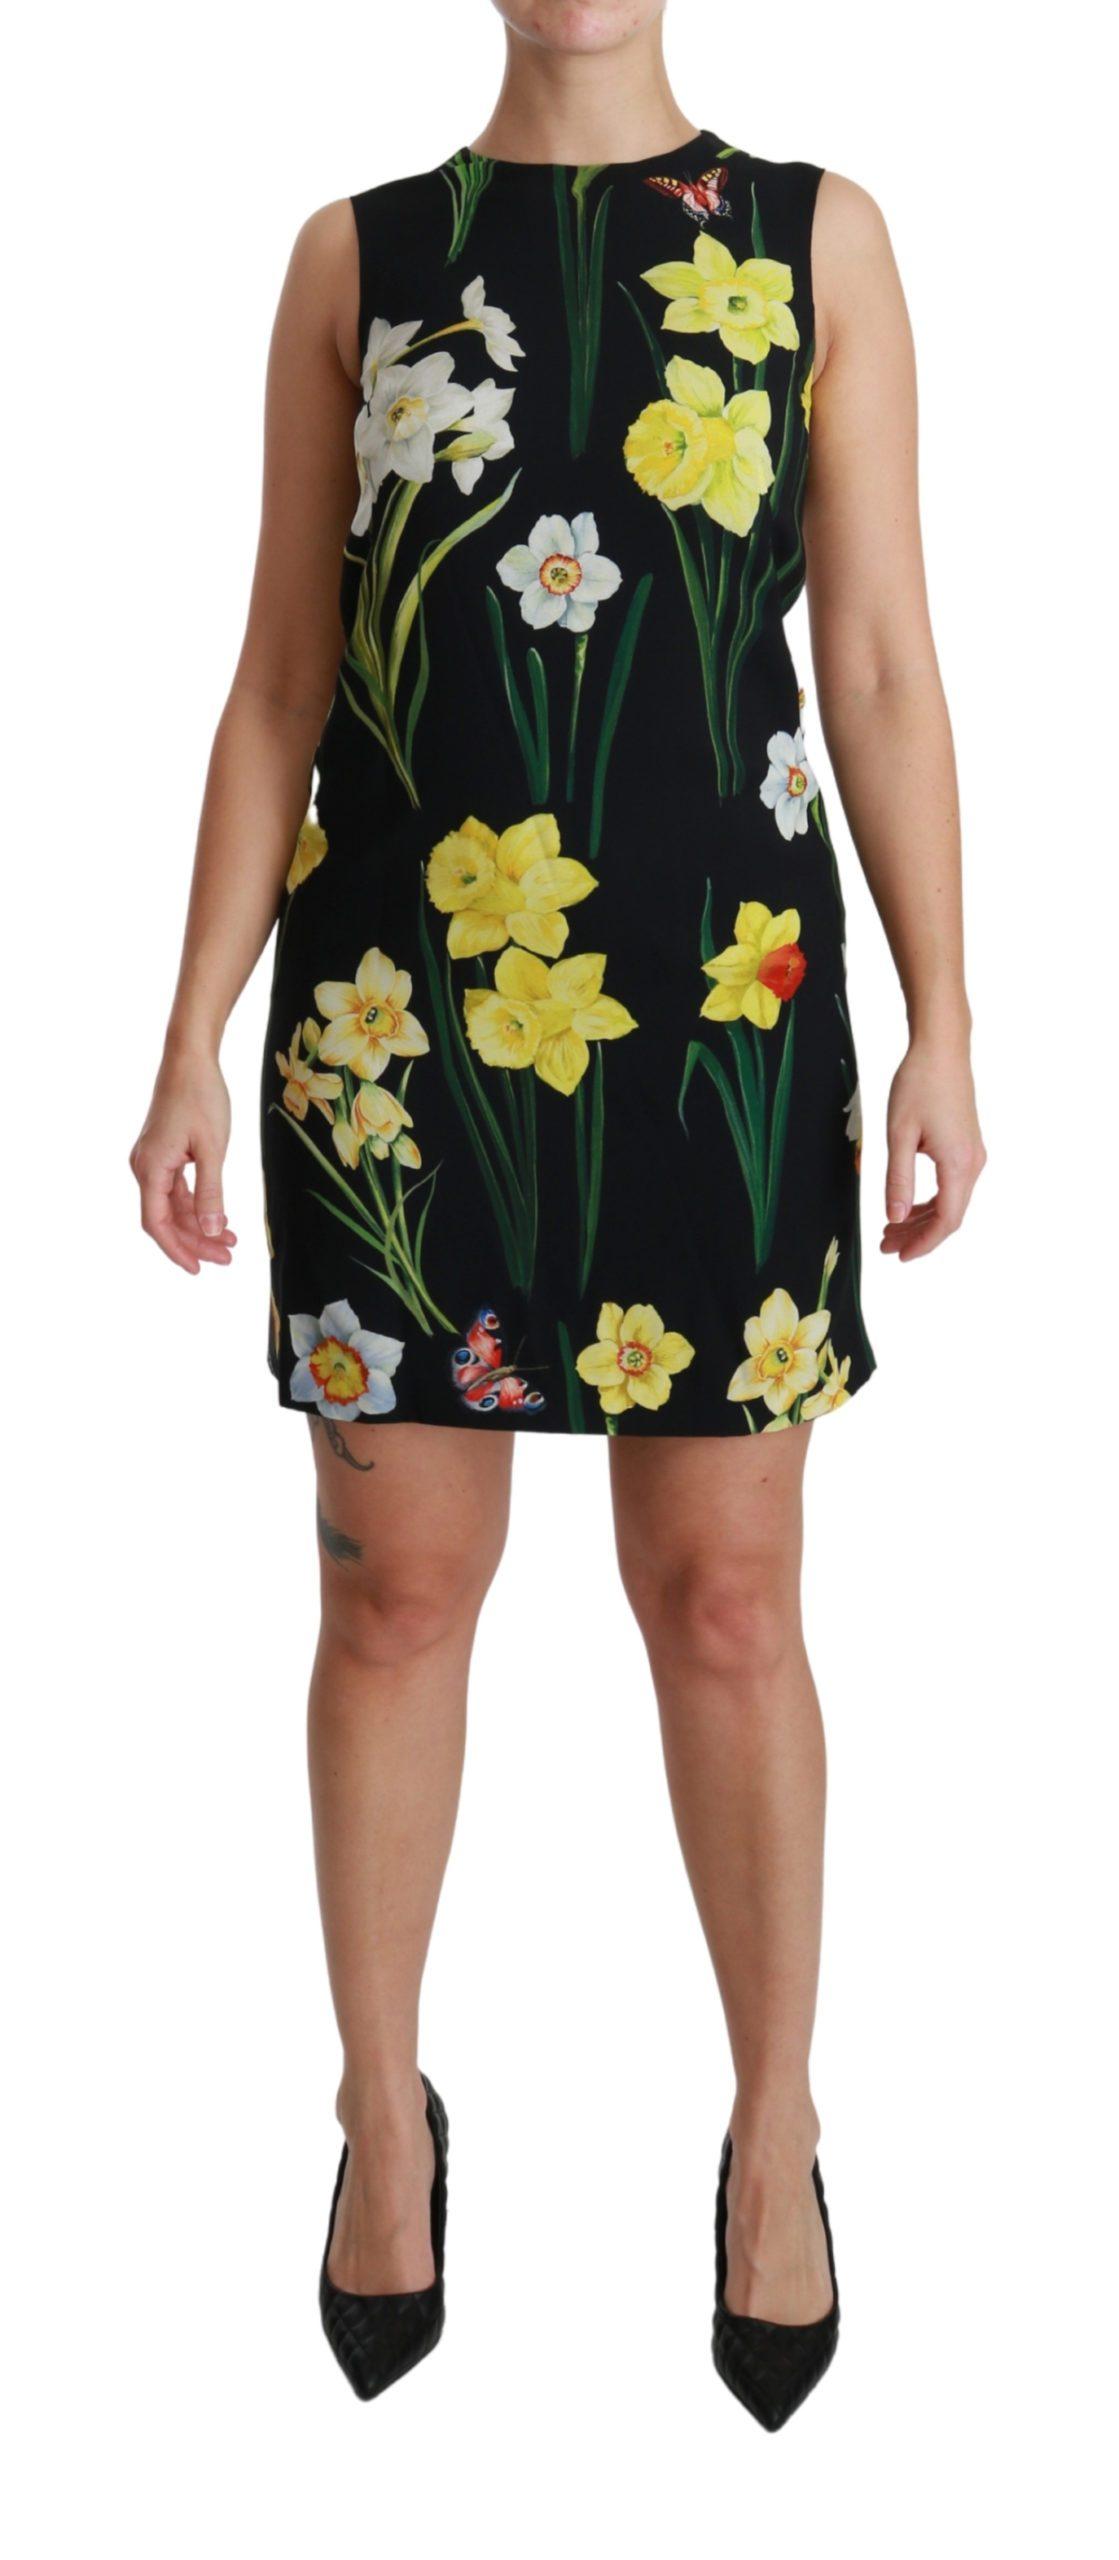 Dolce & Gabbana Women's Floral Sleeveless Sheath Mini Dress Black DR2533 - IT38 XS